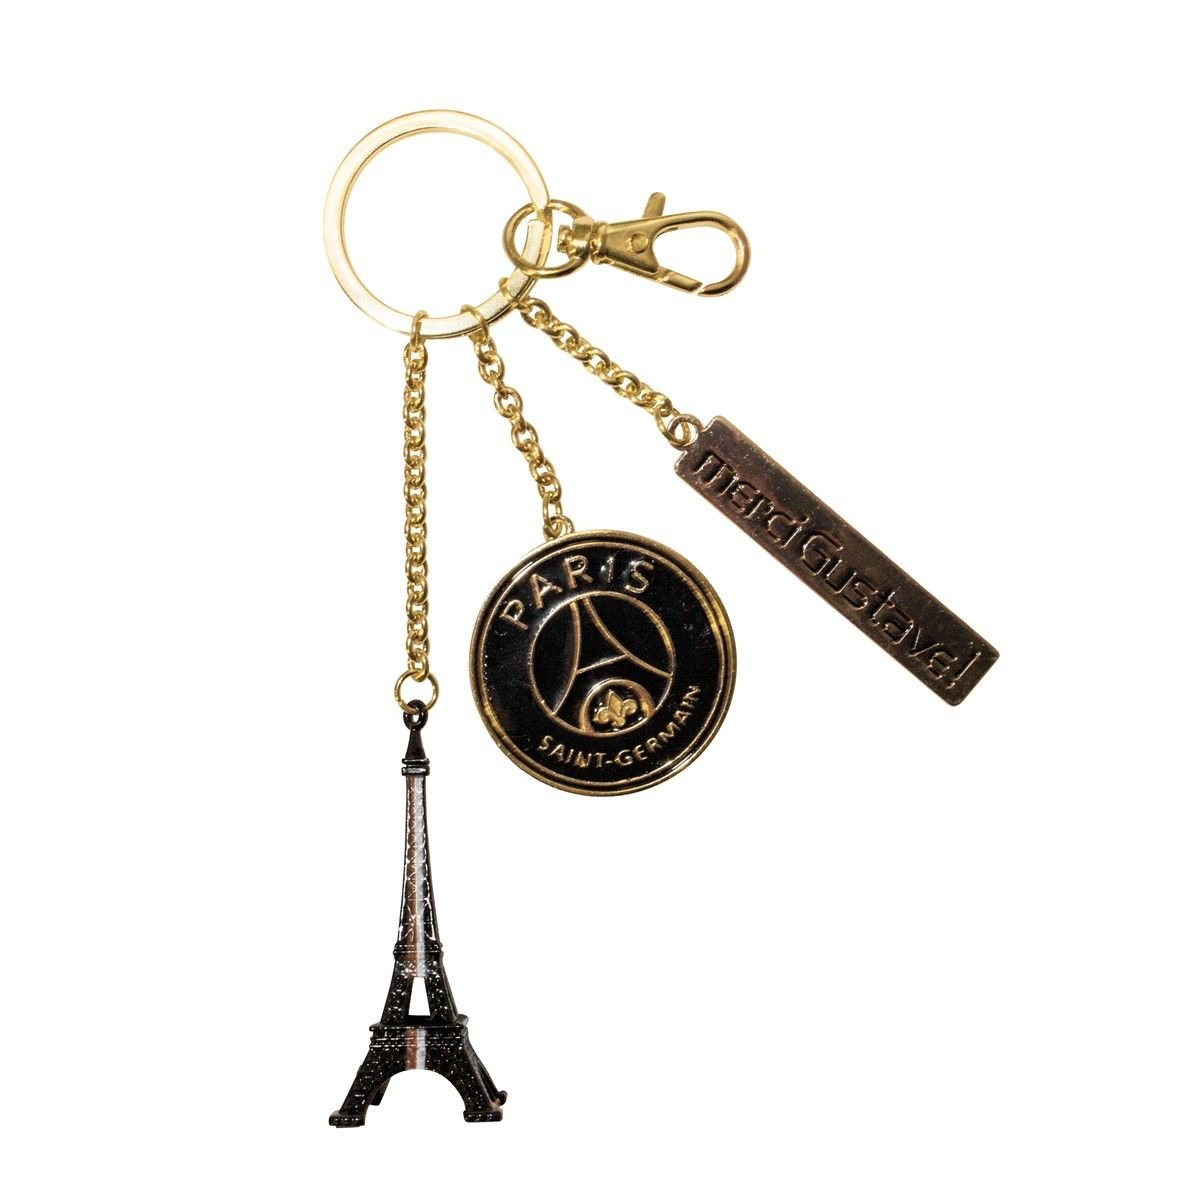 Merci Gustave pocl3101 キーリング ブラックメタル パリ セントジェルマン PSG ブラックライン 8 x 2 x 17.5 cm B01CGMD51K